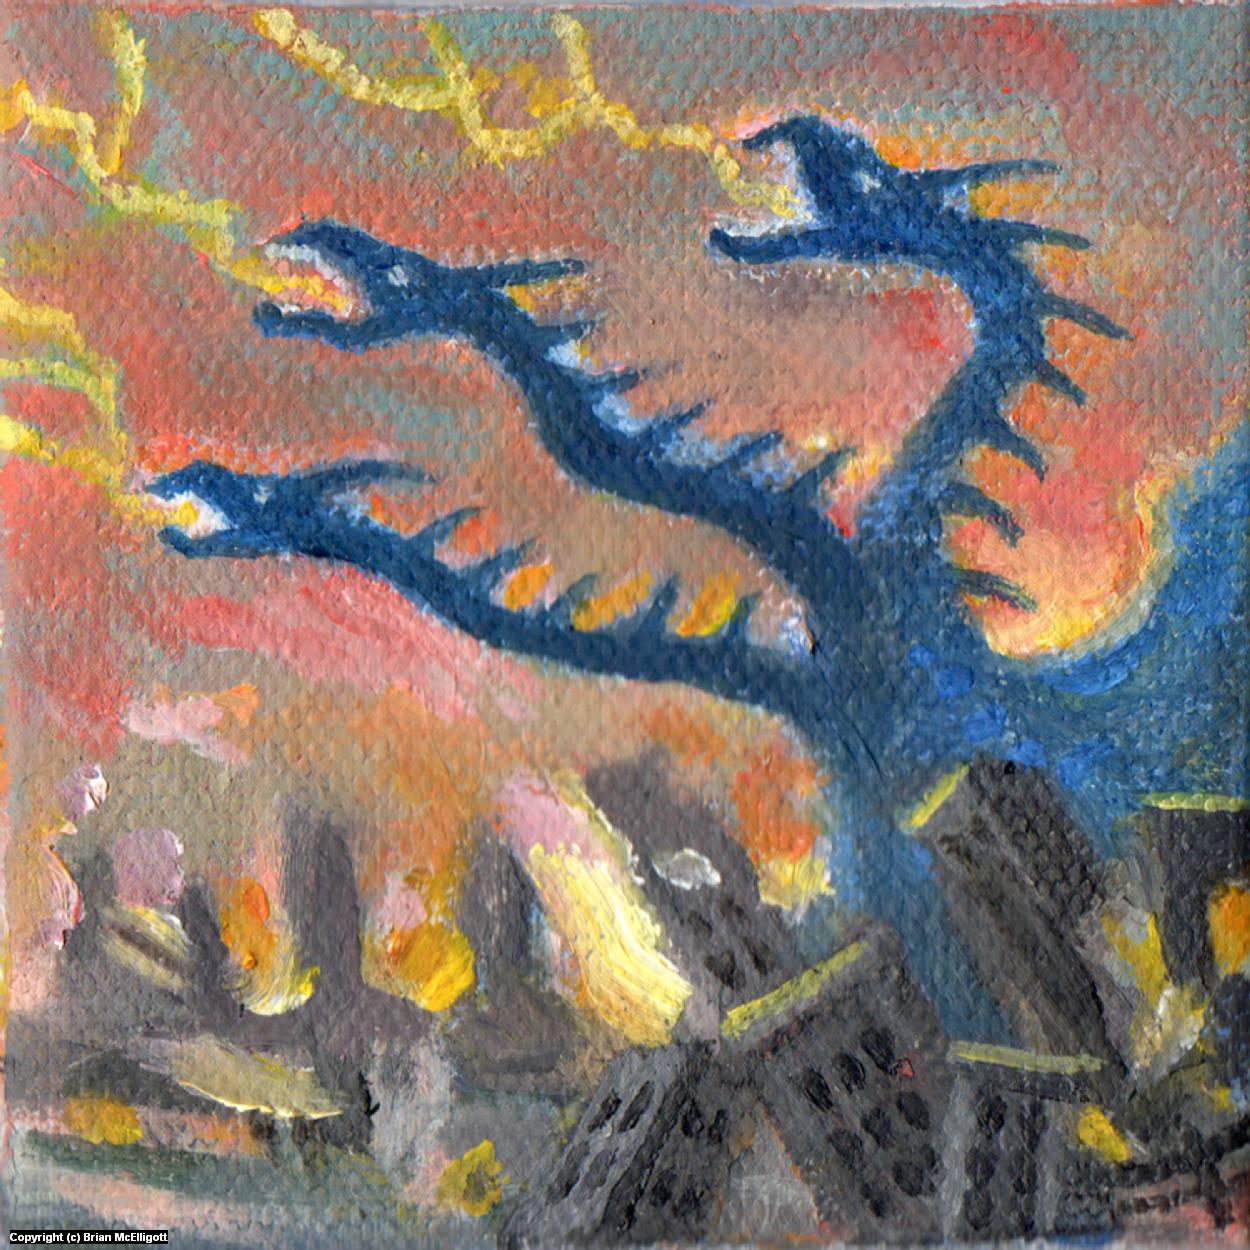 Destroy All Monsters 3 Artwork by Brian McElligott